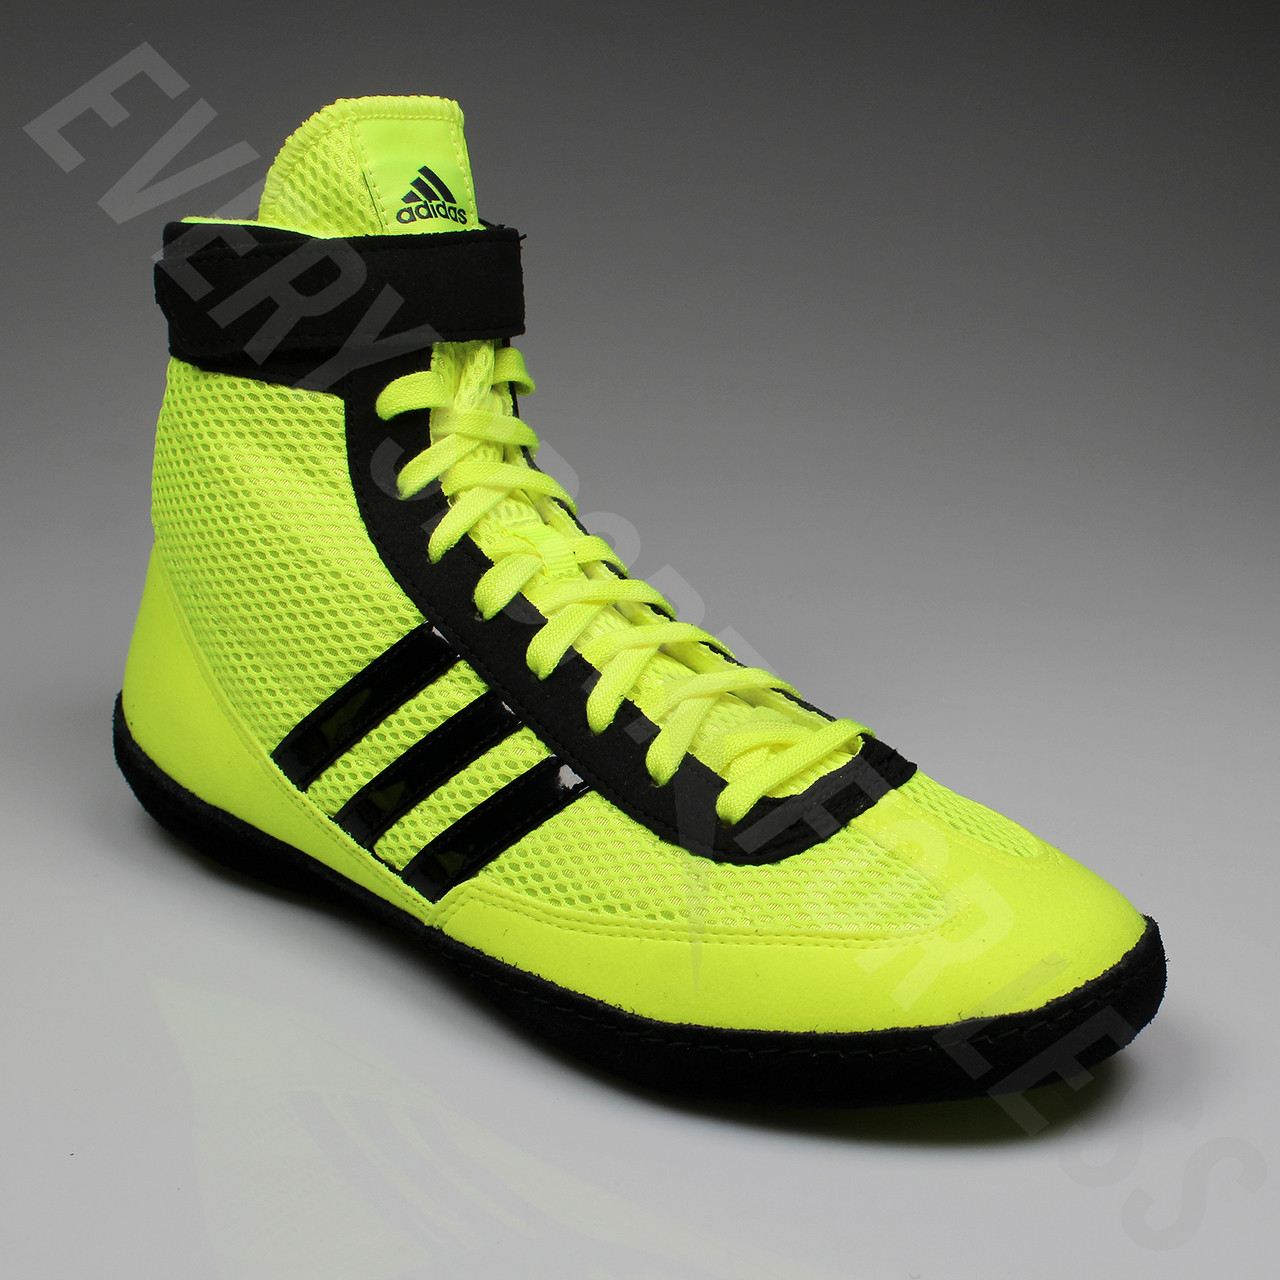 589db627cfe ... Adidas Combat Speed 4 Senior Wrestling Shoes S77933 - Yellow